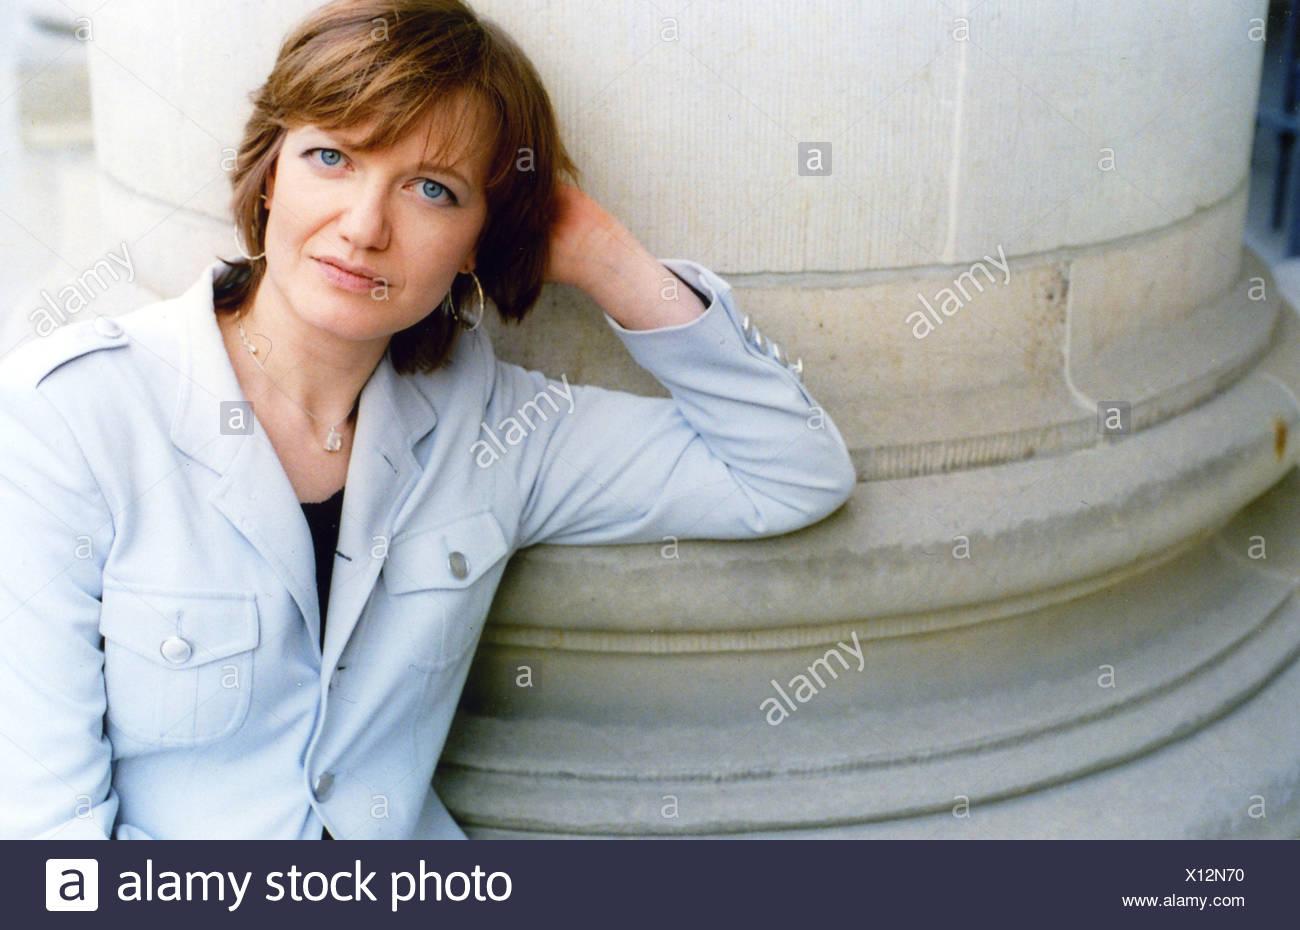 Hummel, Eleonora, * 1970, German author / writer, half length, International PEN Congress, Berlin, 22. - 28.5.2006, Additional-Rights-Clearances-NA - Stock Image